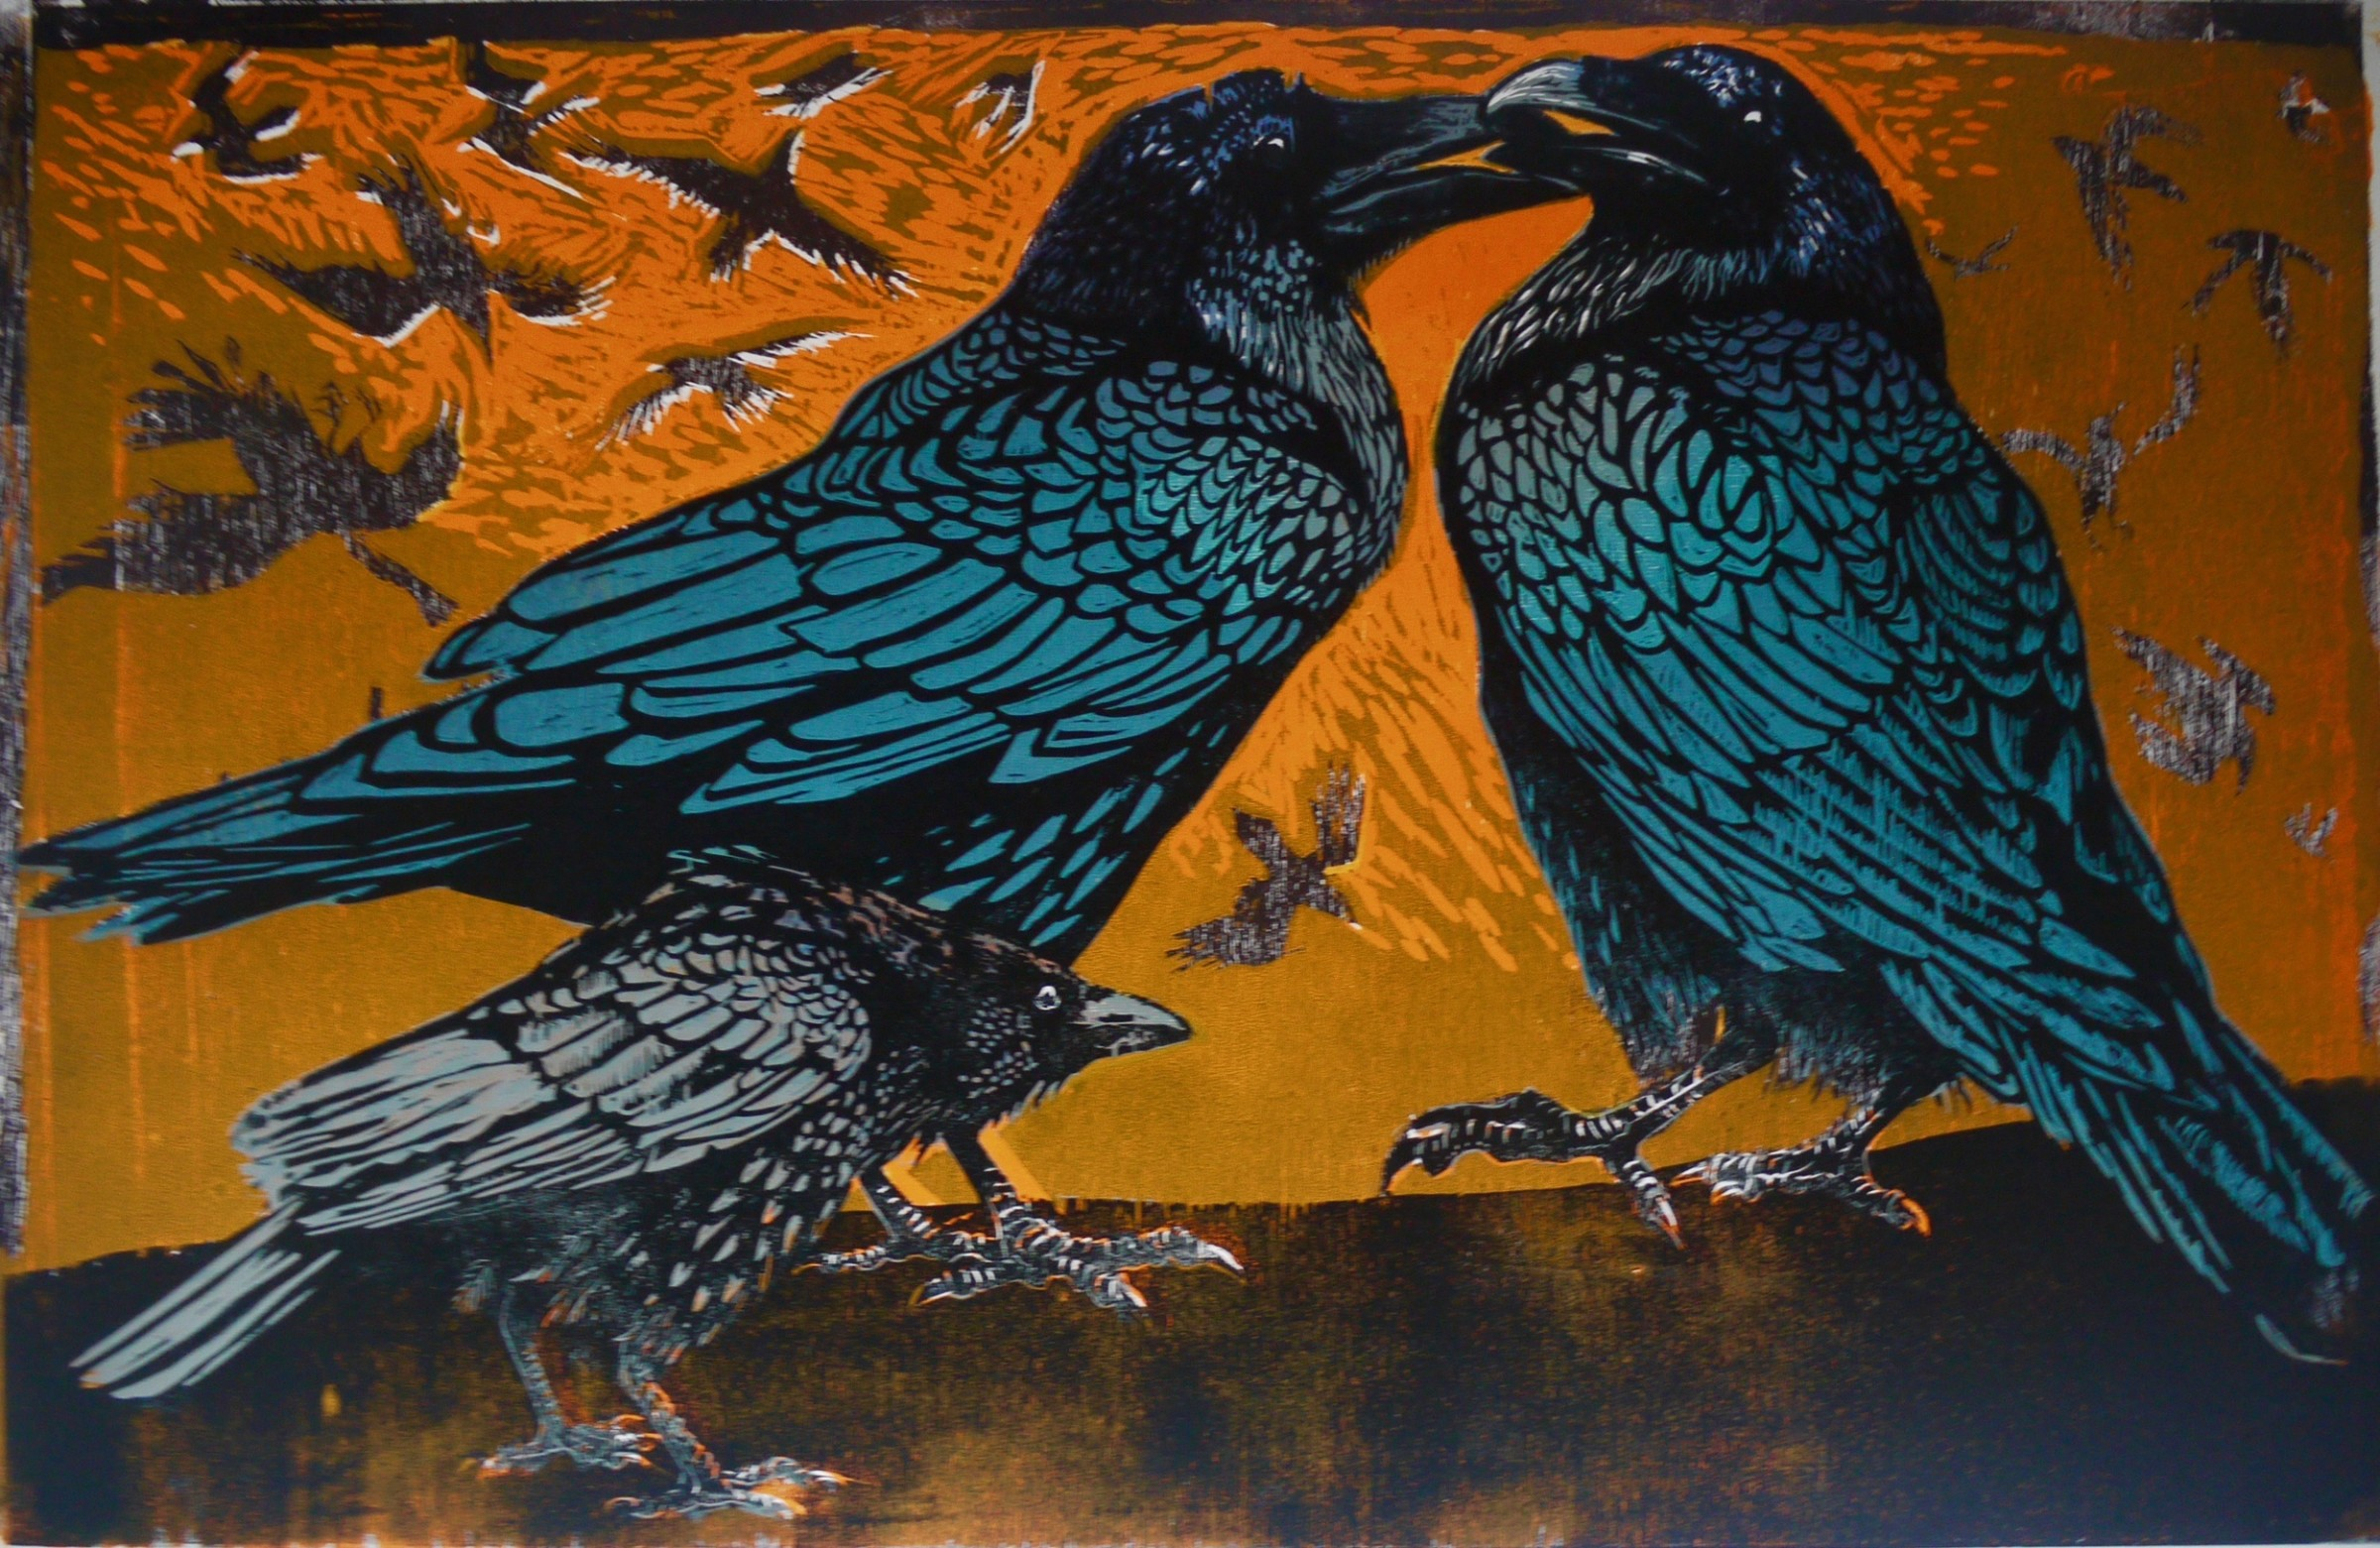 "<span class=""link fancybox-details-link""><a href=""/exhibitions/20/works/artworks_standalone10774/"">View Detail Page</a></span><div class=""artist""><span class=""artist""><strong>Julia Manning RE</strong></span></div><div class=""title""><em>Crow Disturbs The Ravens 3</em></div><div class=""medium"">wood cuts<br></div><div class=""dimensions"">60 x 90 cm image size</div><div class=""edition_details"">edition of 20</div>"